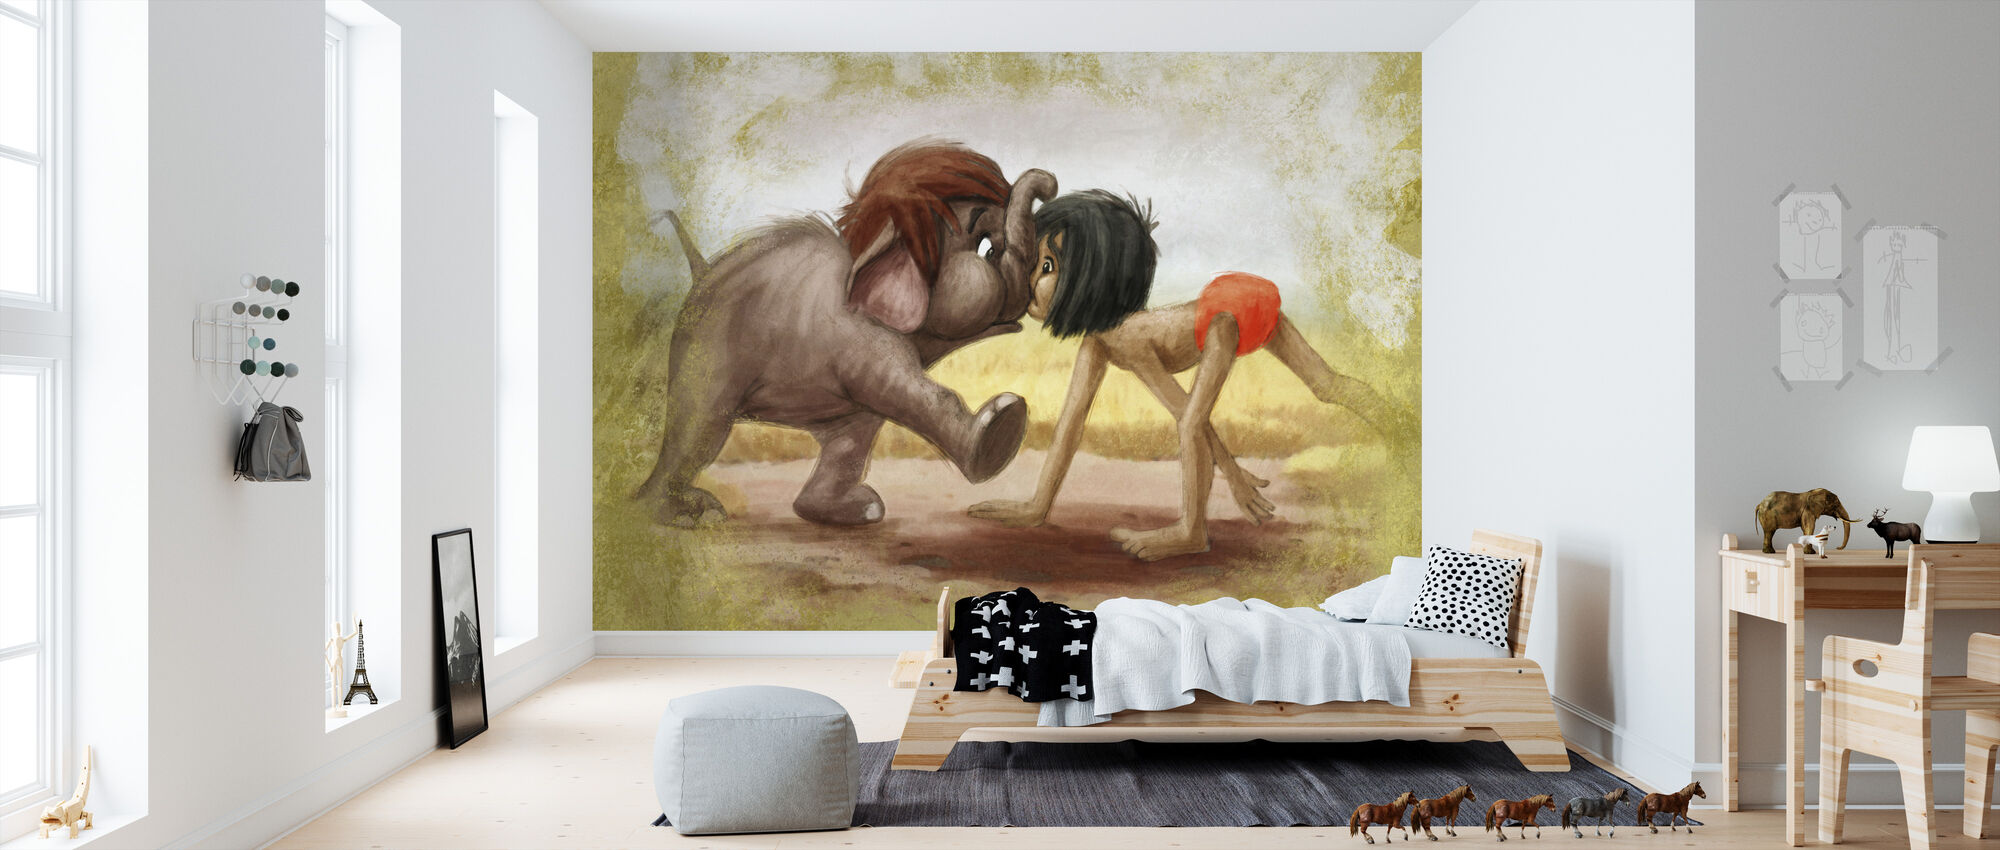 Disney Classics - Jungle Book - Tapet - Barnerom